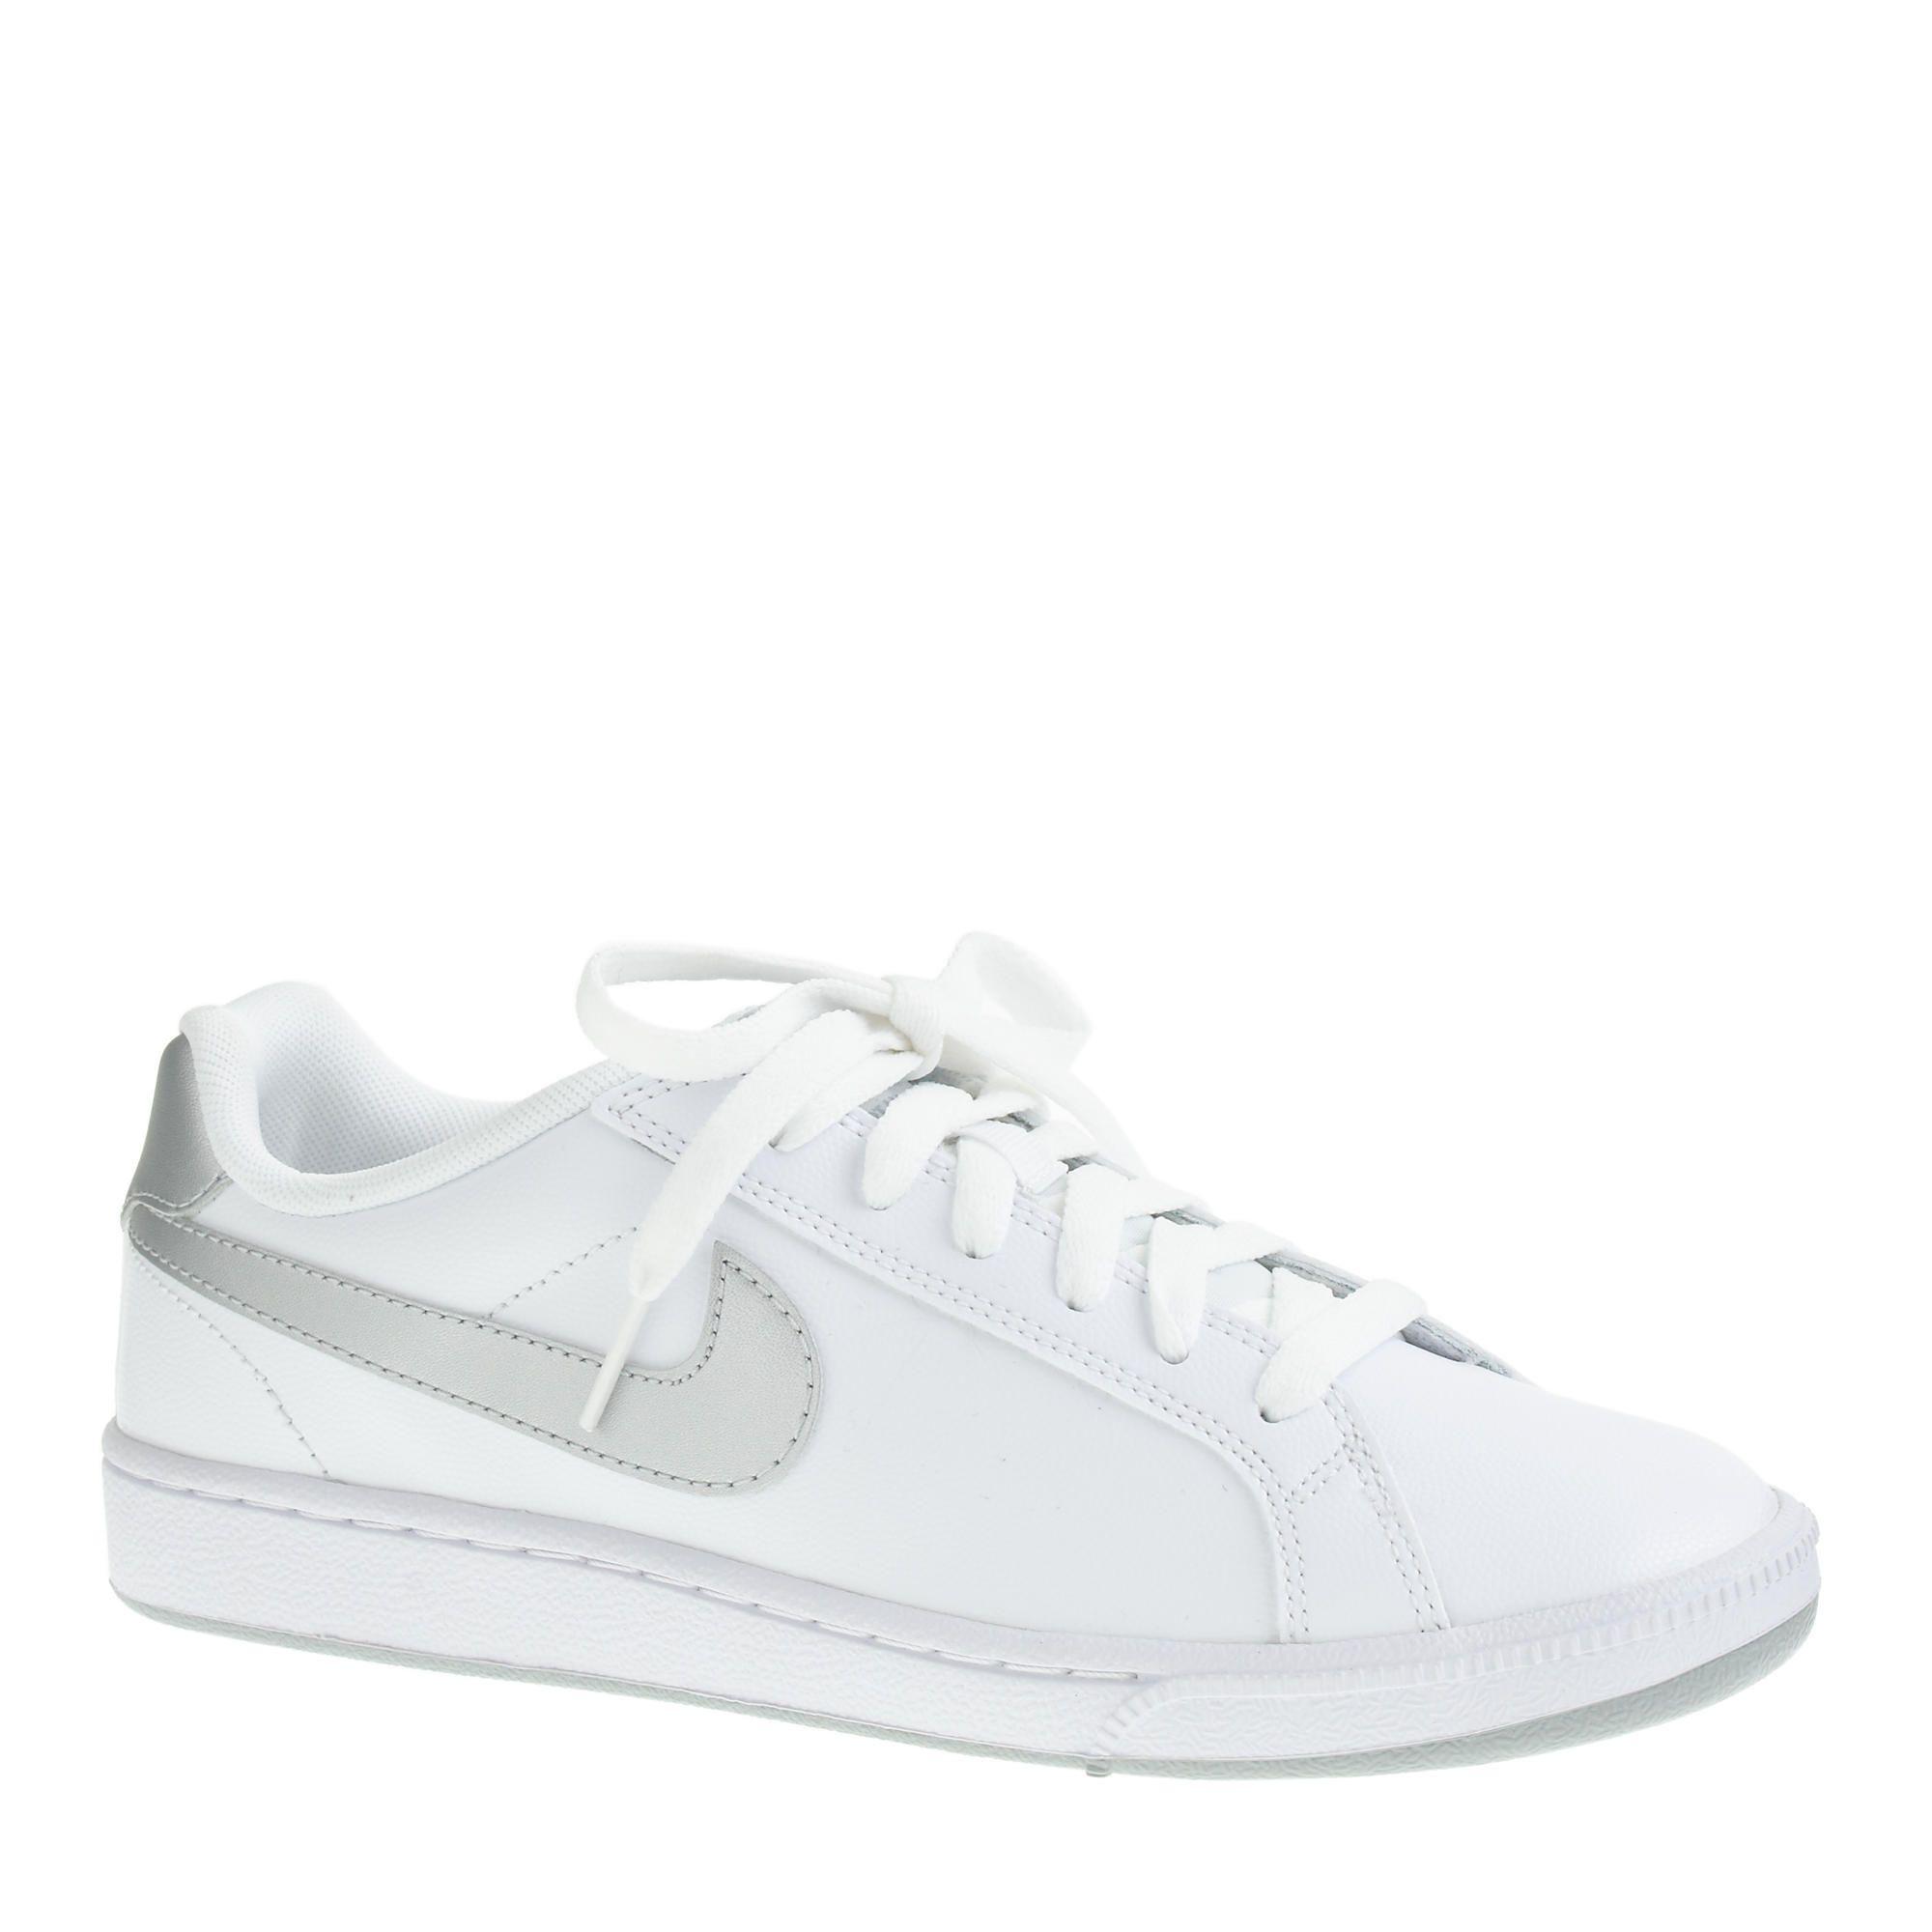 Nike Court Majestic sneakers | J.Crew